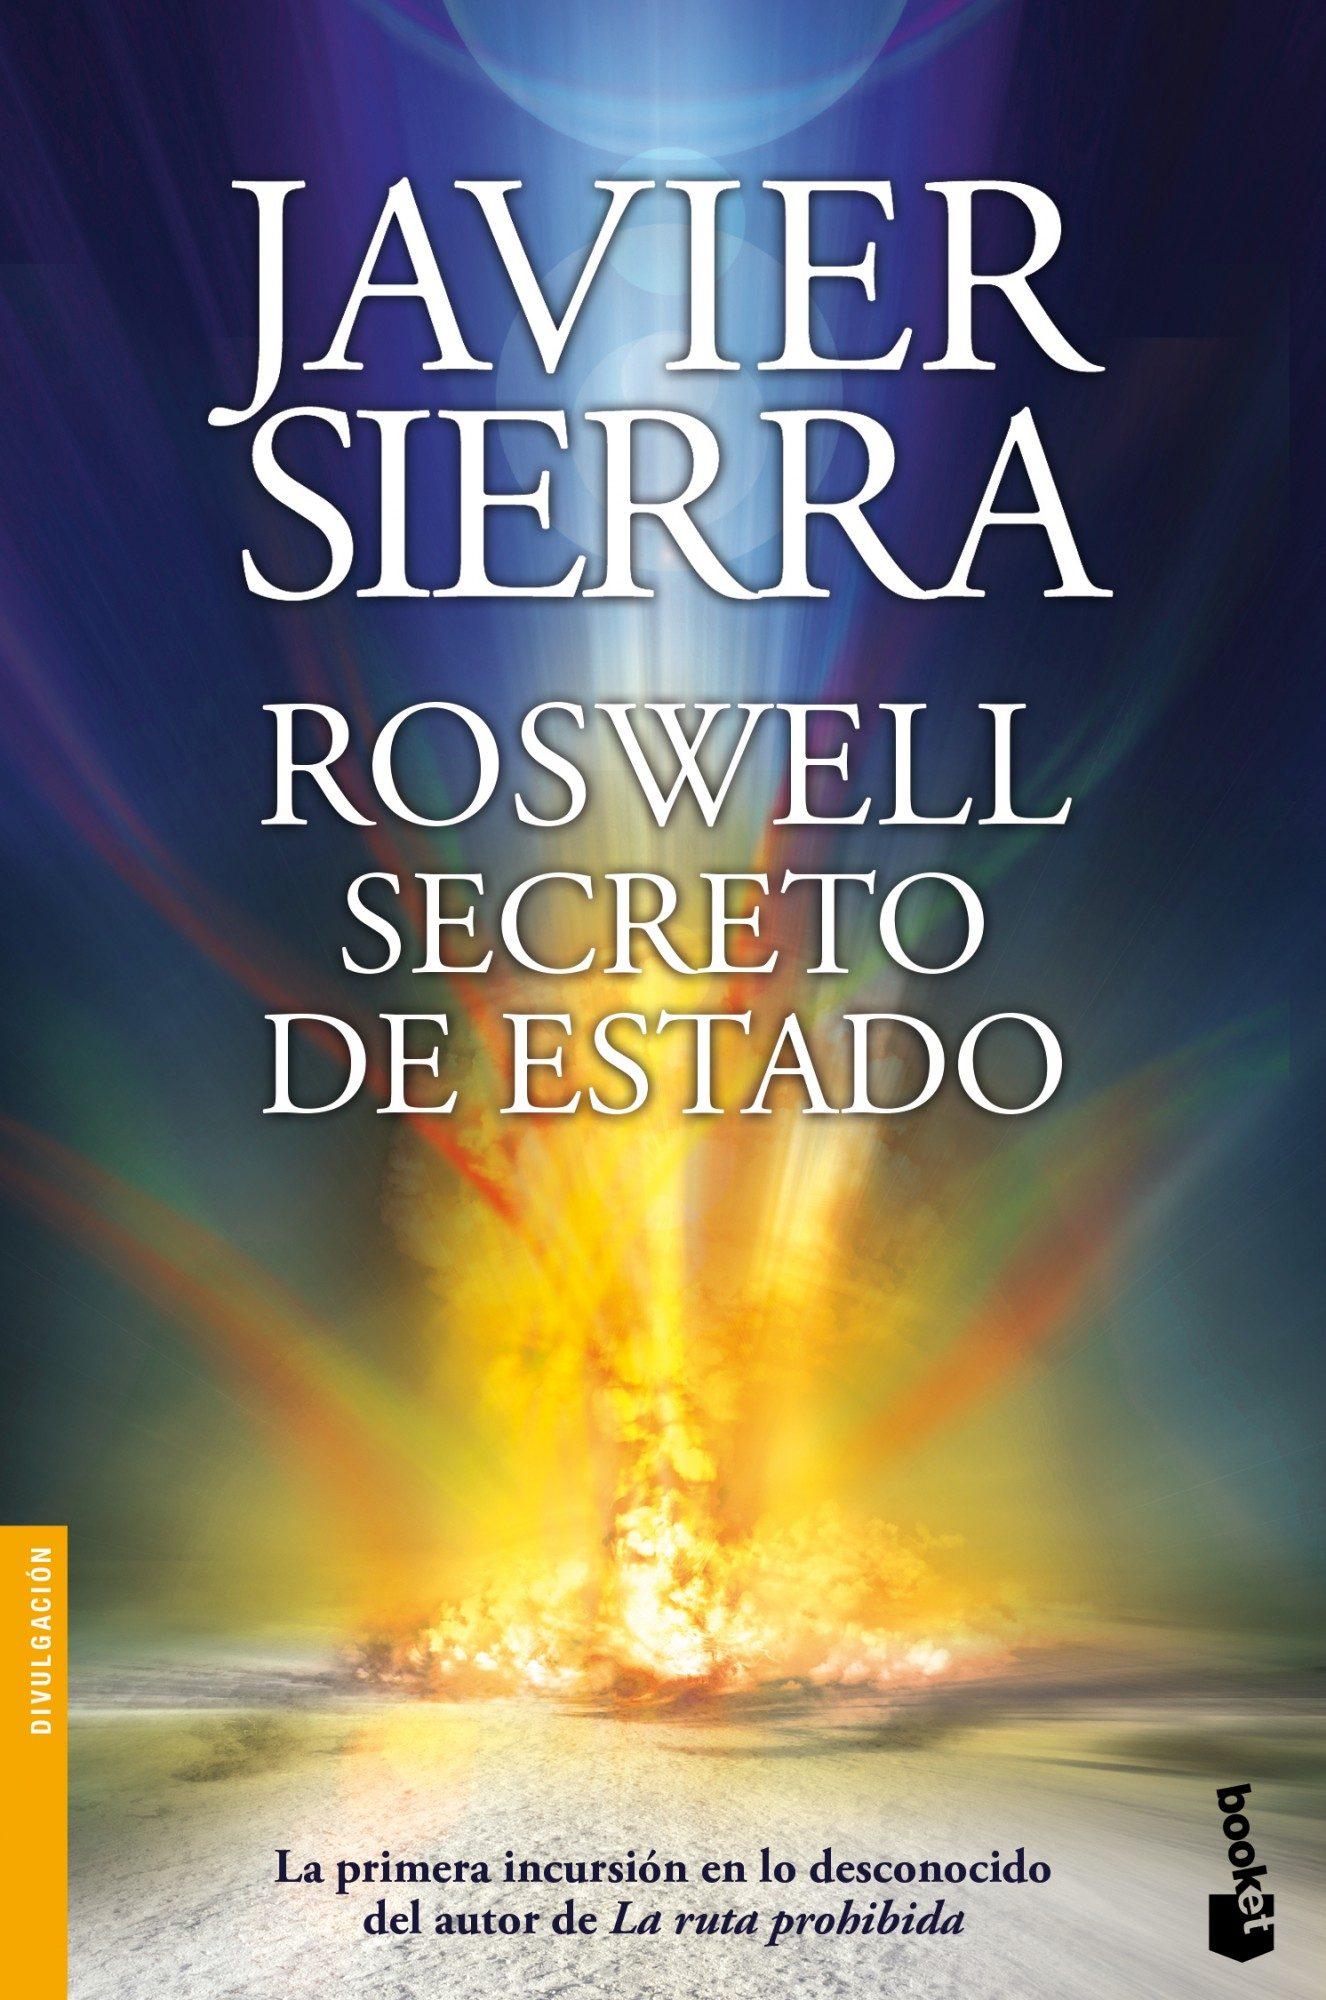 Roswell: Secreto de Estado - Javier Sierra - Booket